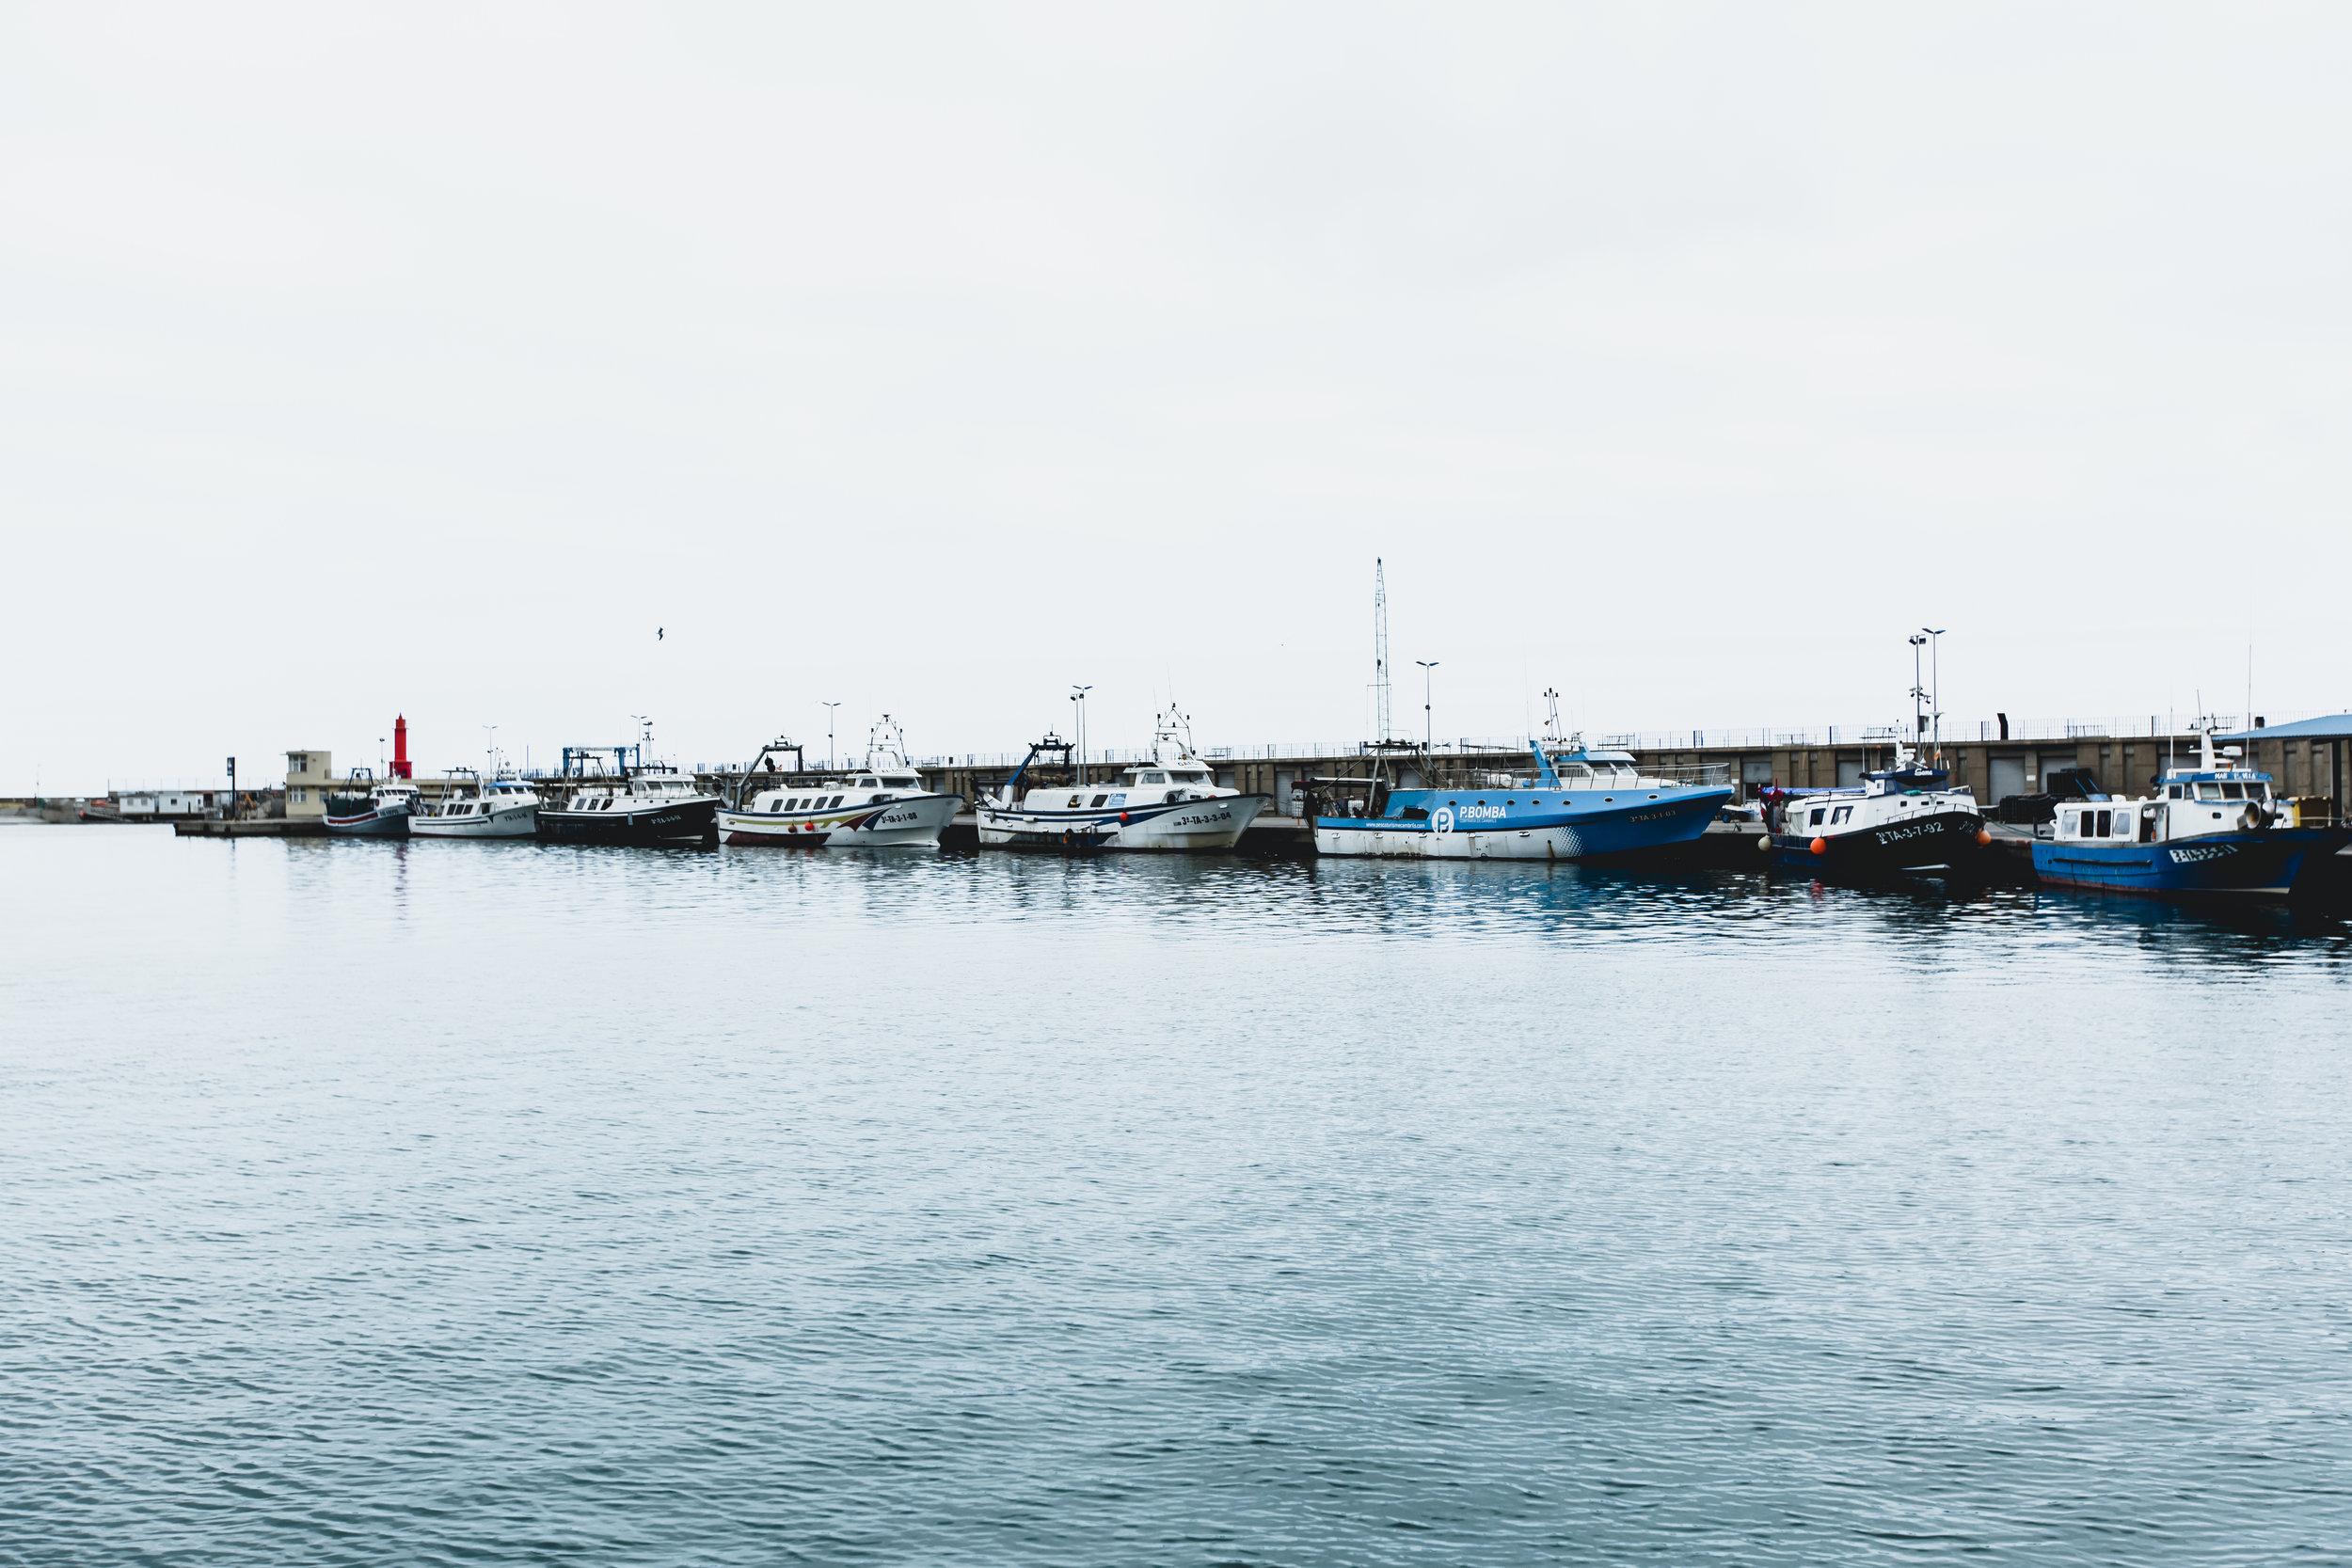 Cambrils harbor